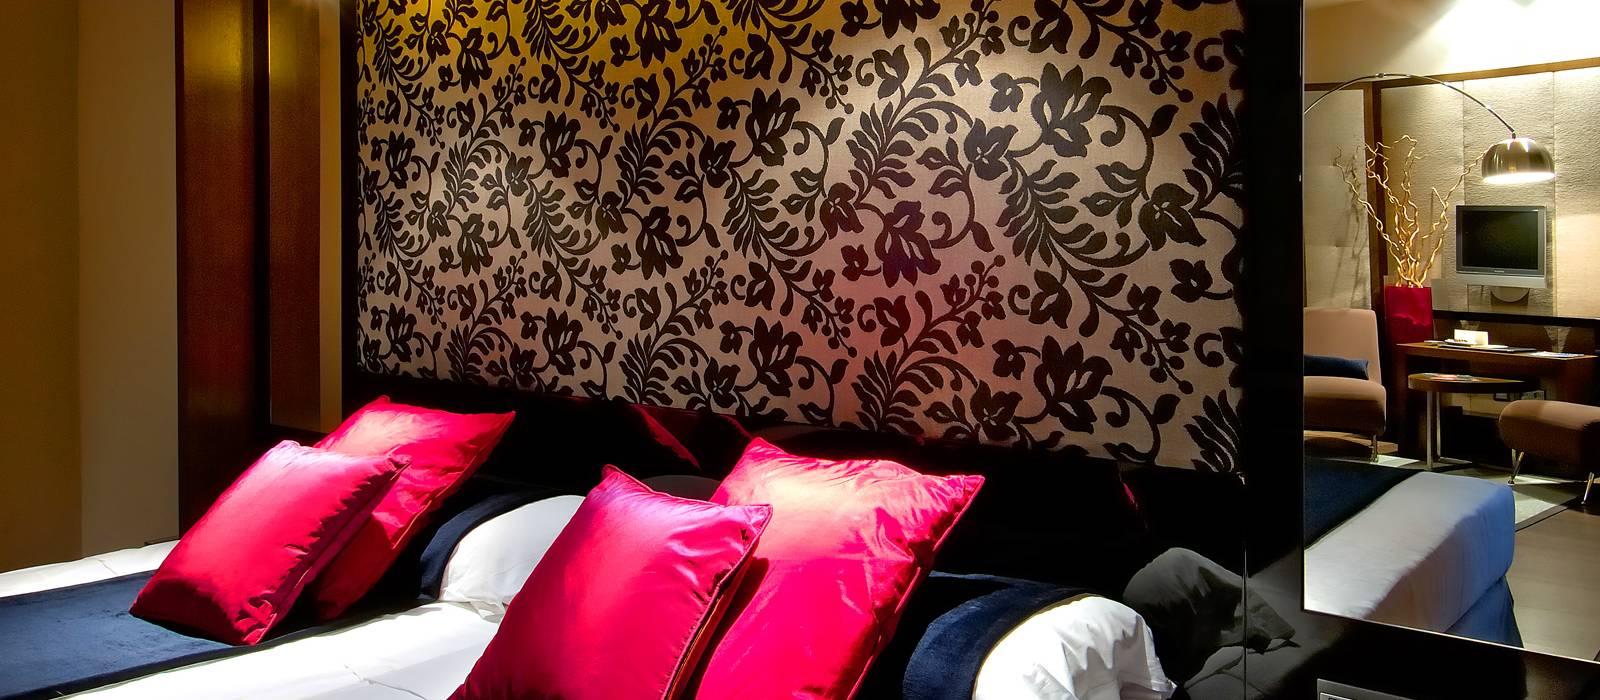 Offres Soho Hôtel Madrid - Vincci Hoteles - Speciales Deux Nuits